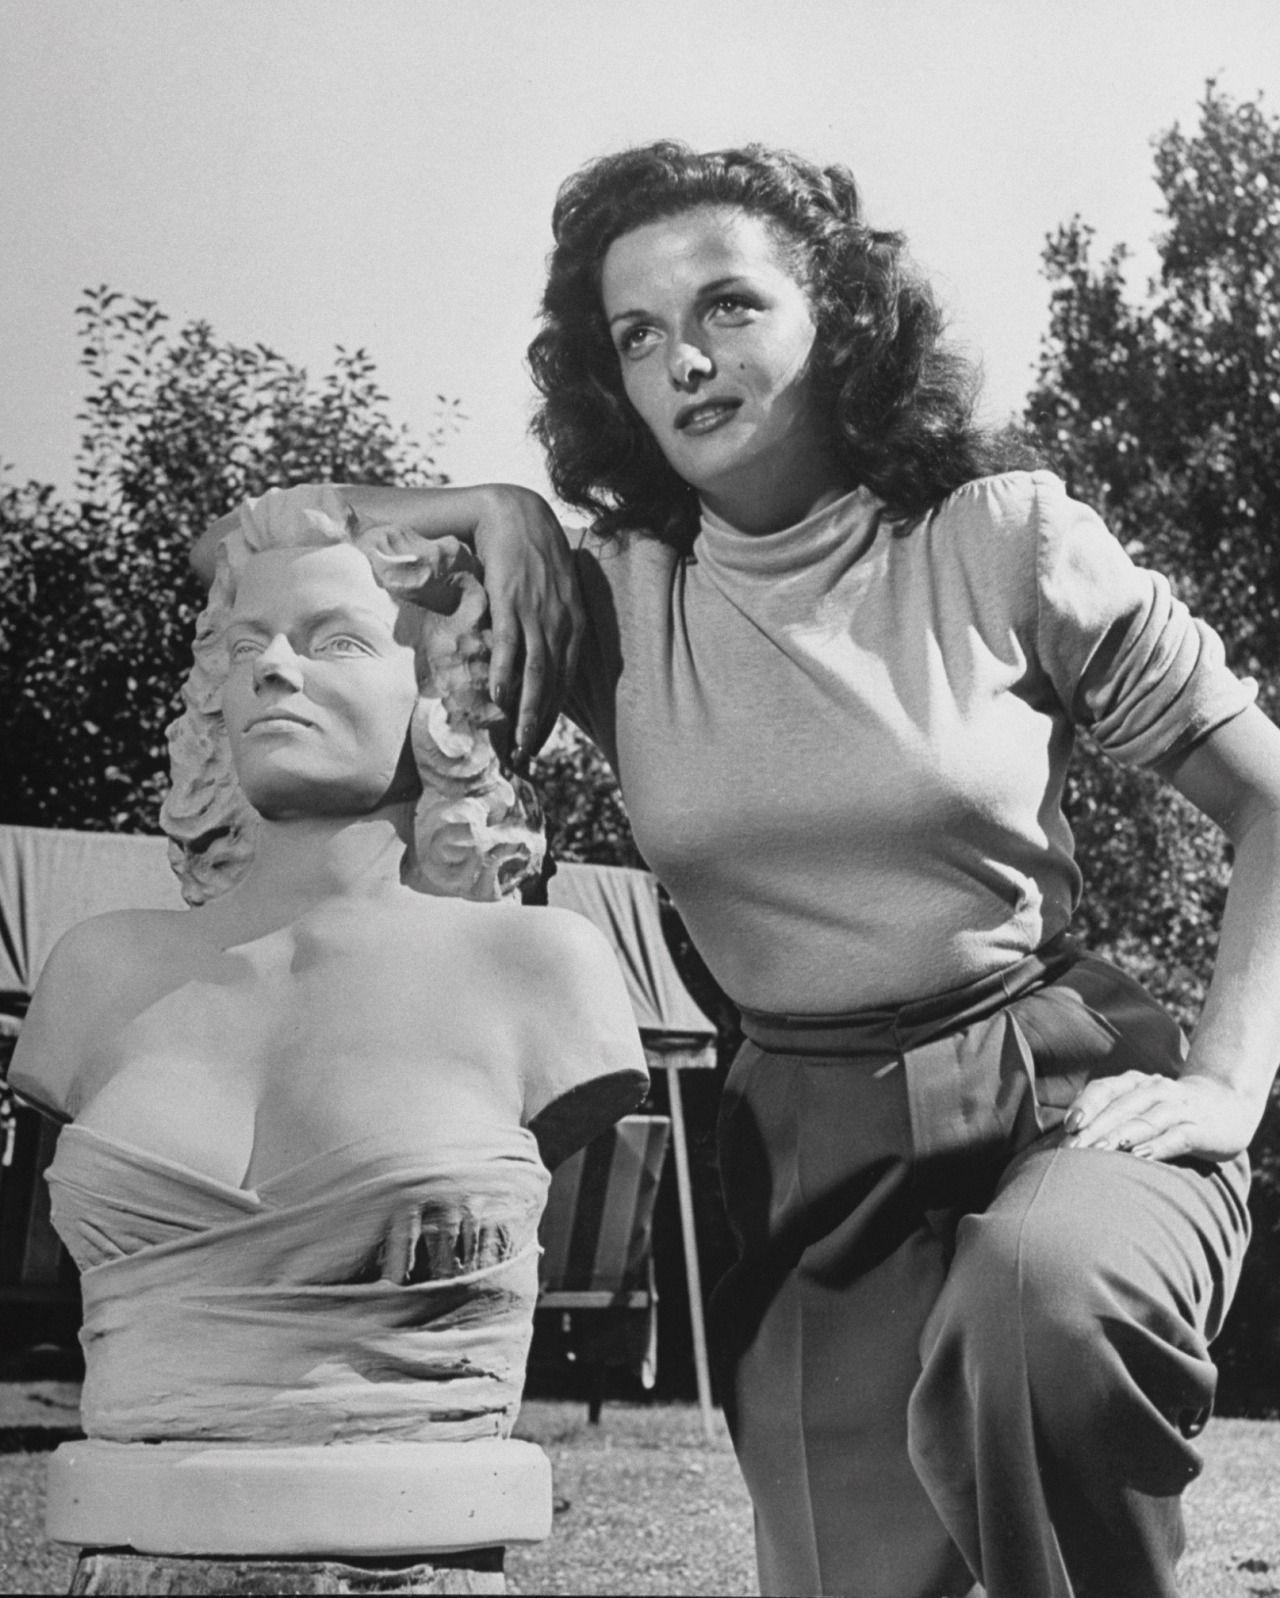 Jane Russell By Ralph Crane, 1944